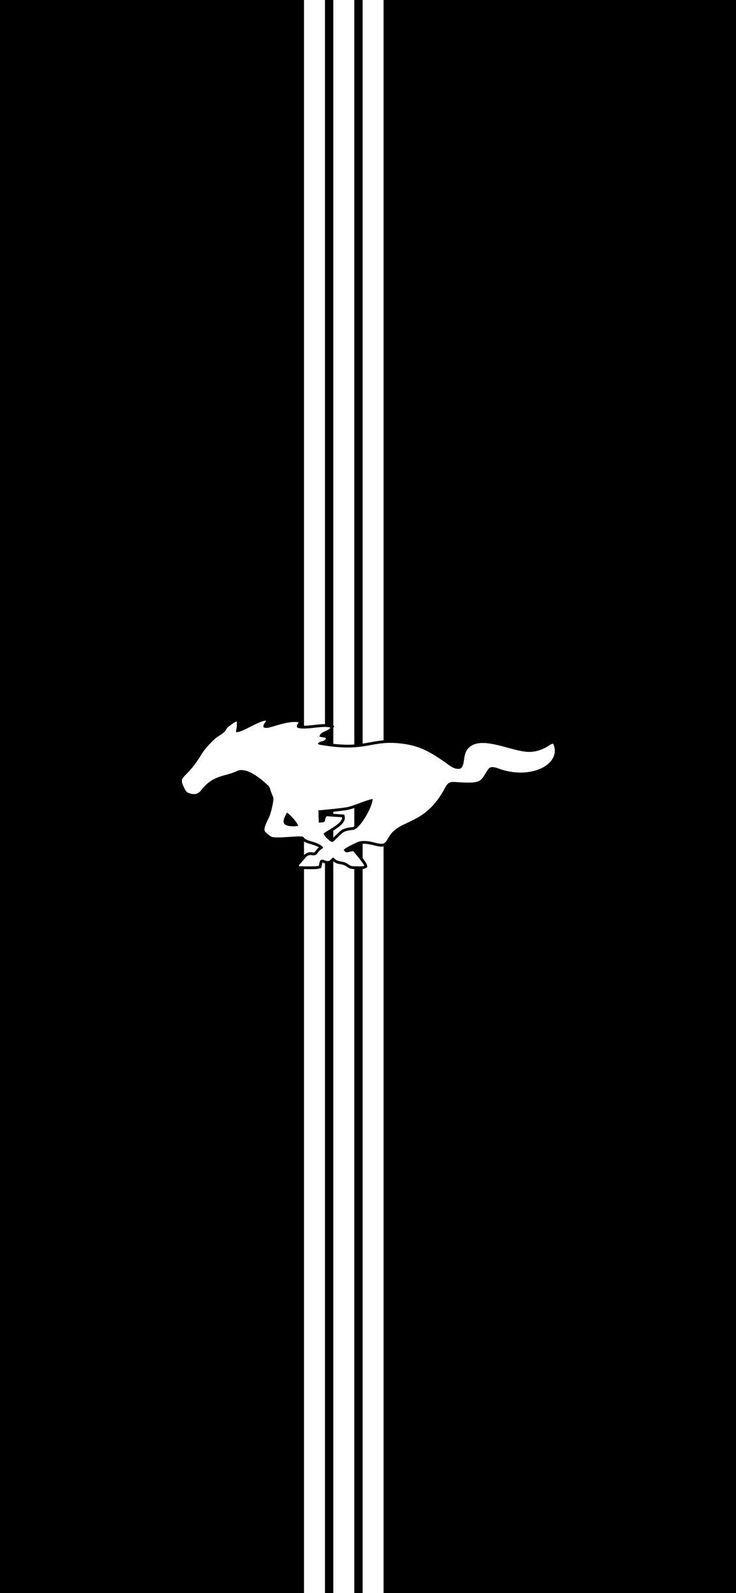 Wallpaper Iphone Car Mustang Blackandwhite Black Wallpapers Cool Backgrounds App Has Been Tested Ford Mustang Wallpaper Mustang Wallpaper Mustang Logo